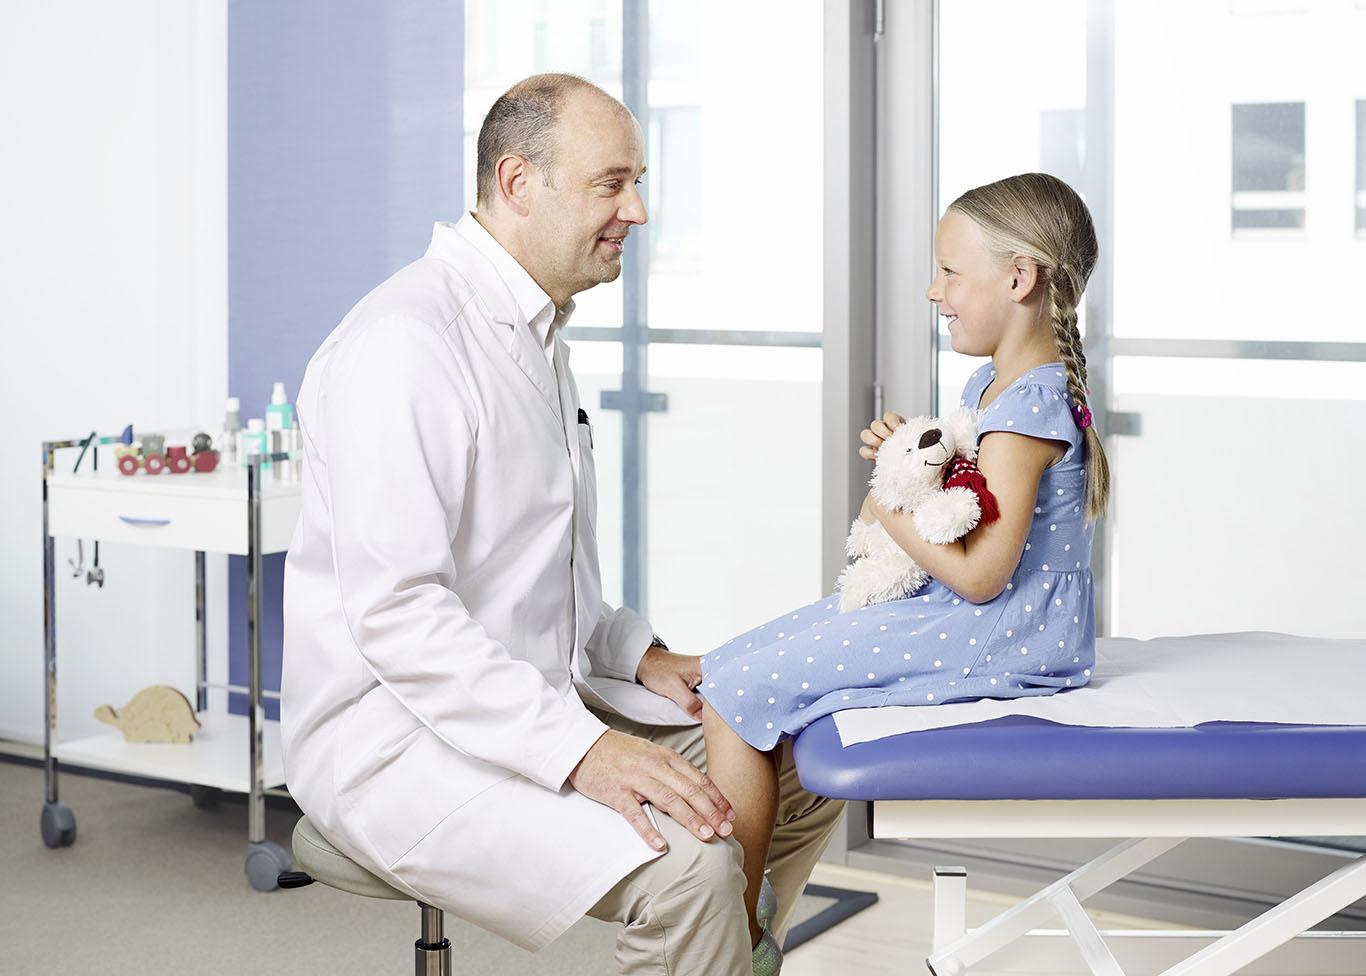 paediatrics_01.jpg